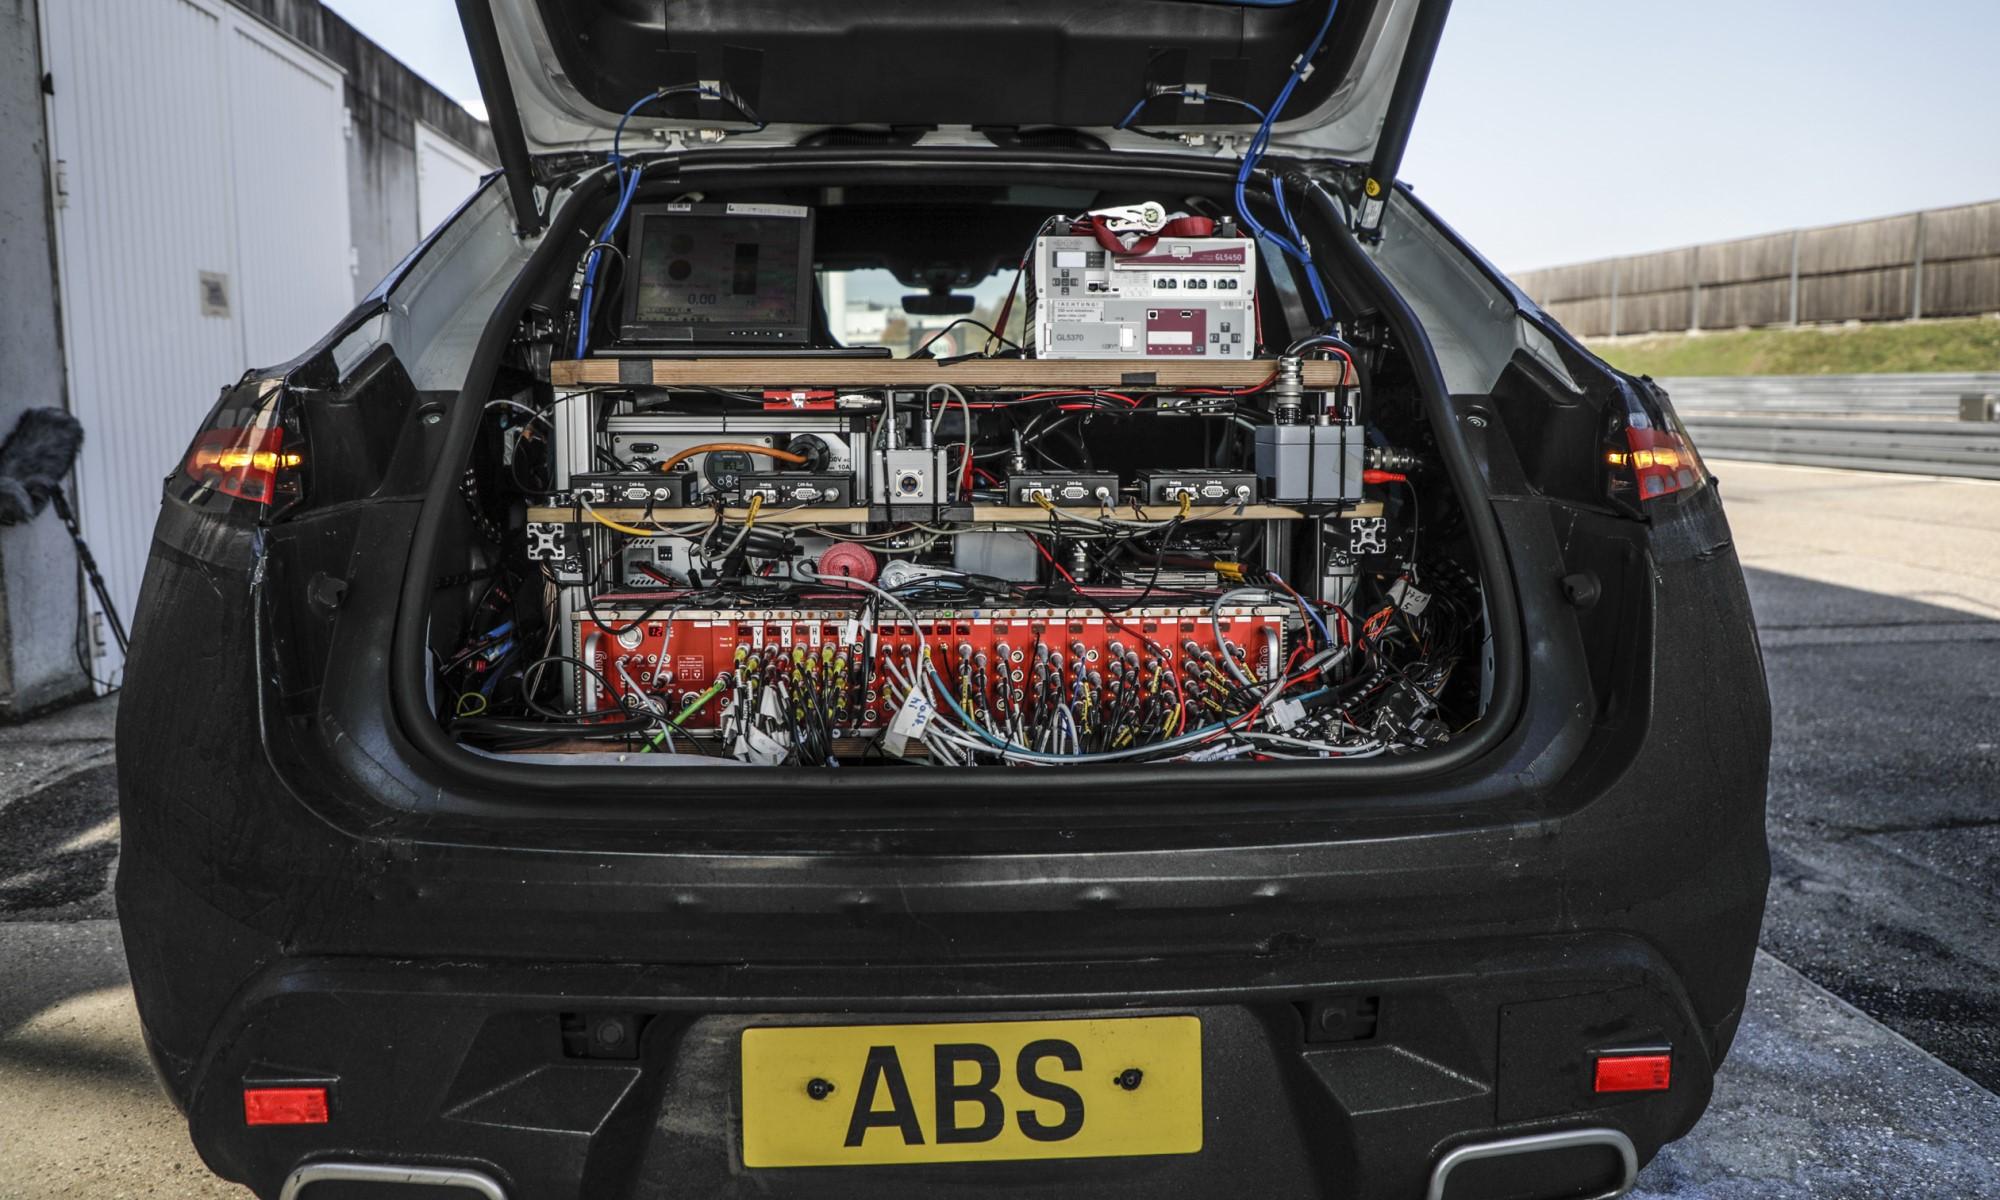 Electric Porsche Macan data acquisition